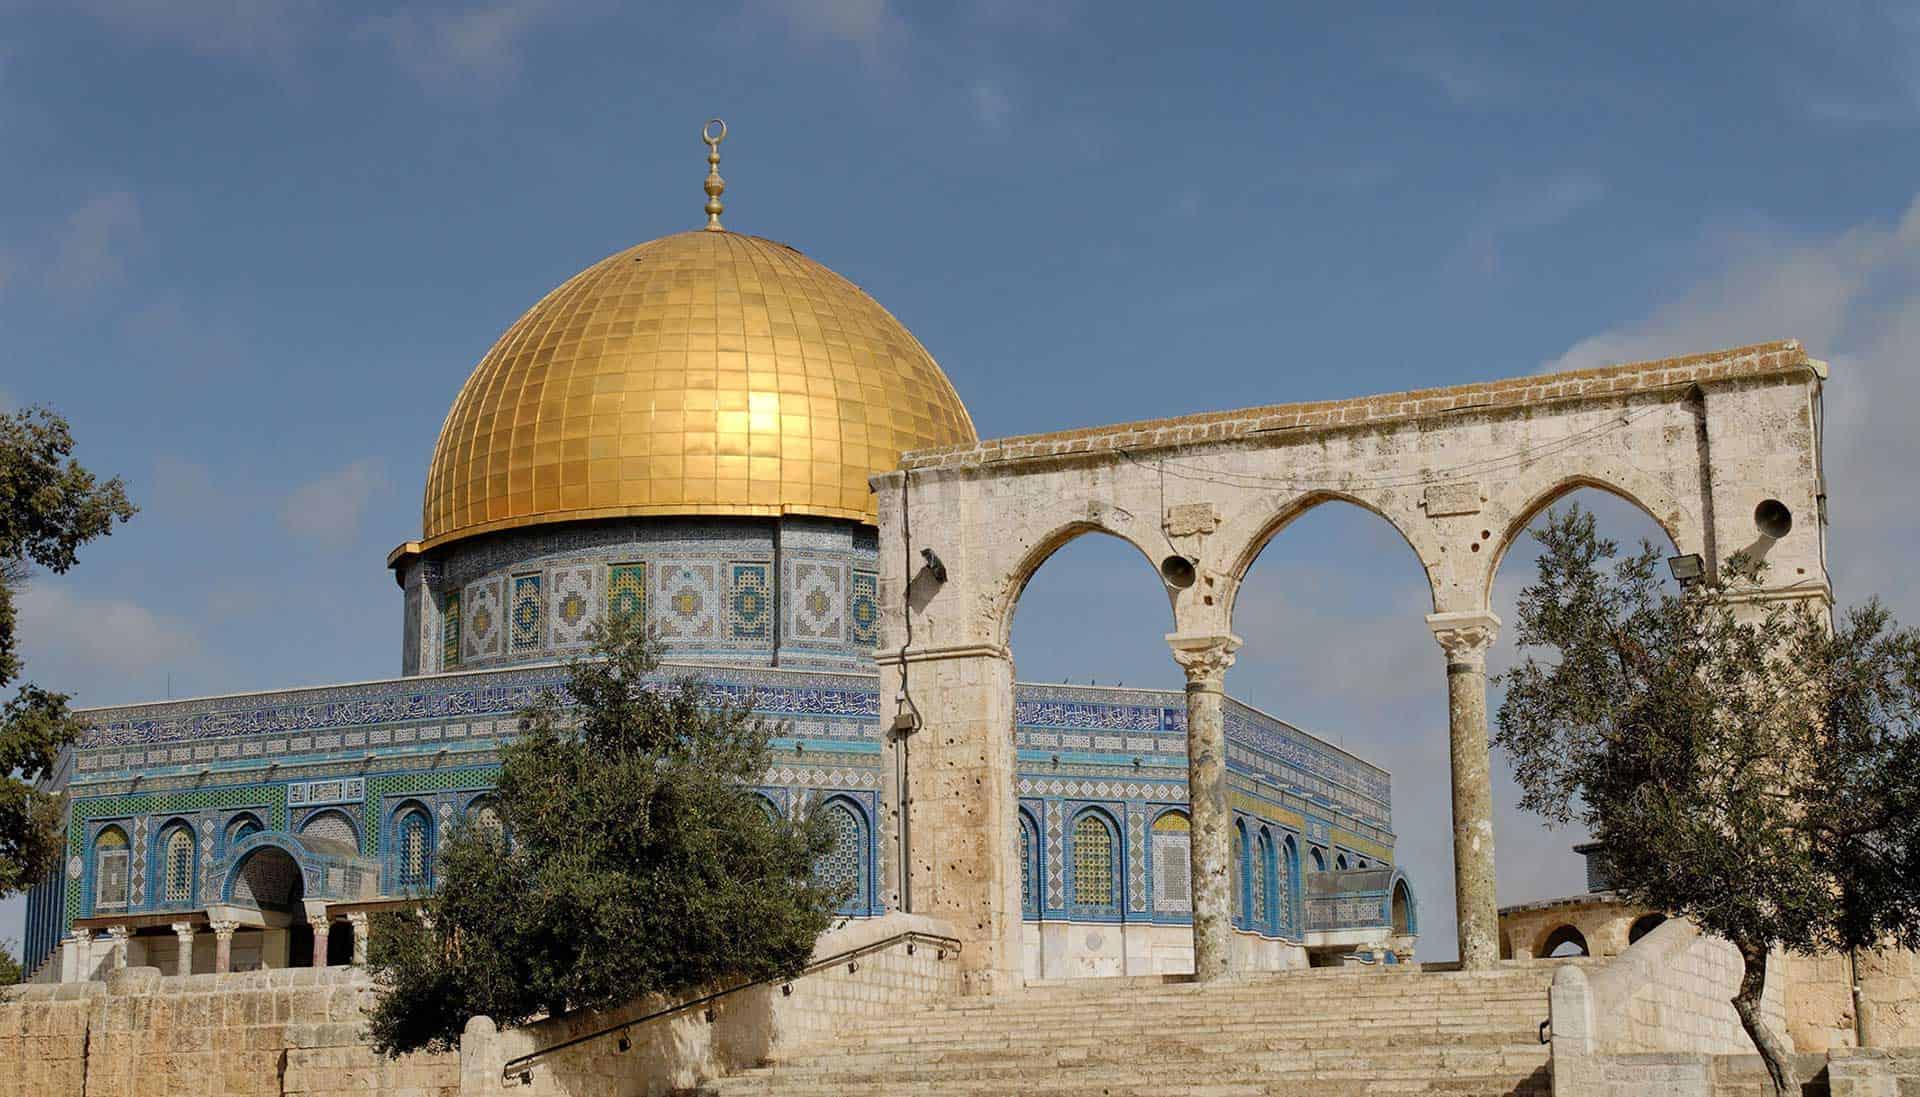 Dome of the Rock, Jerusalem image